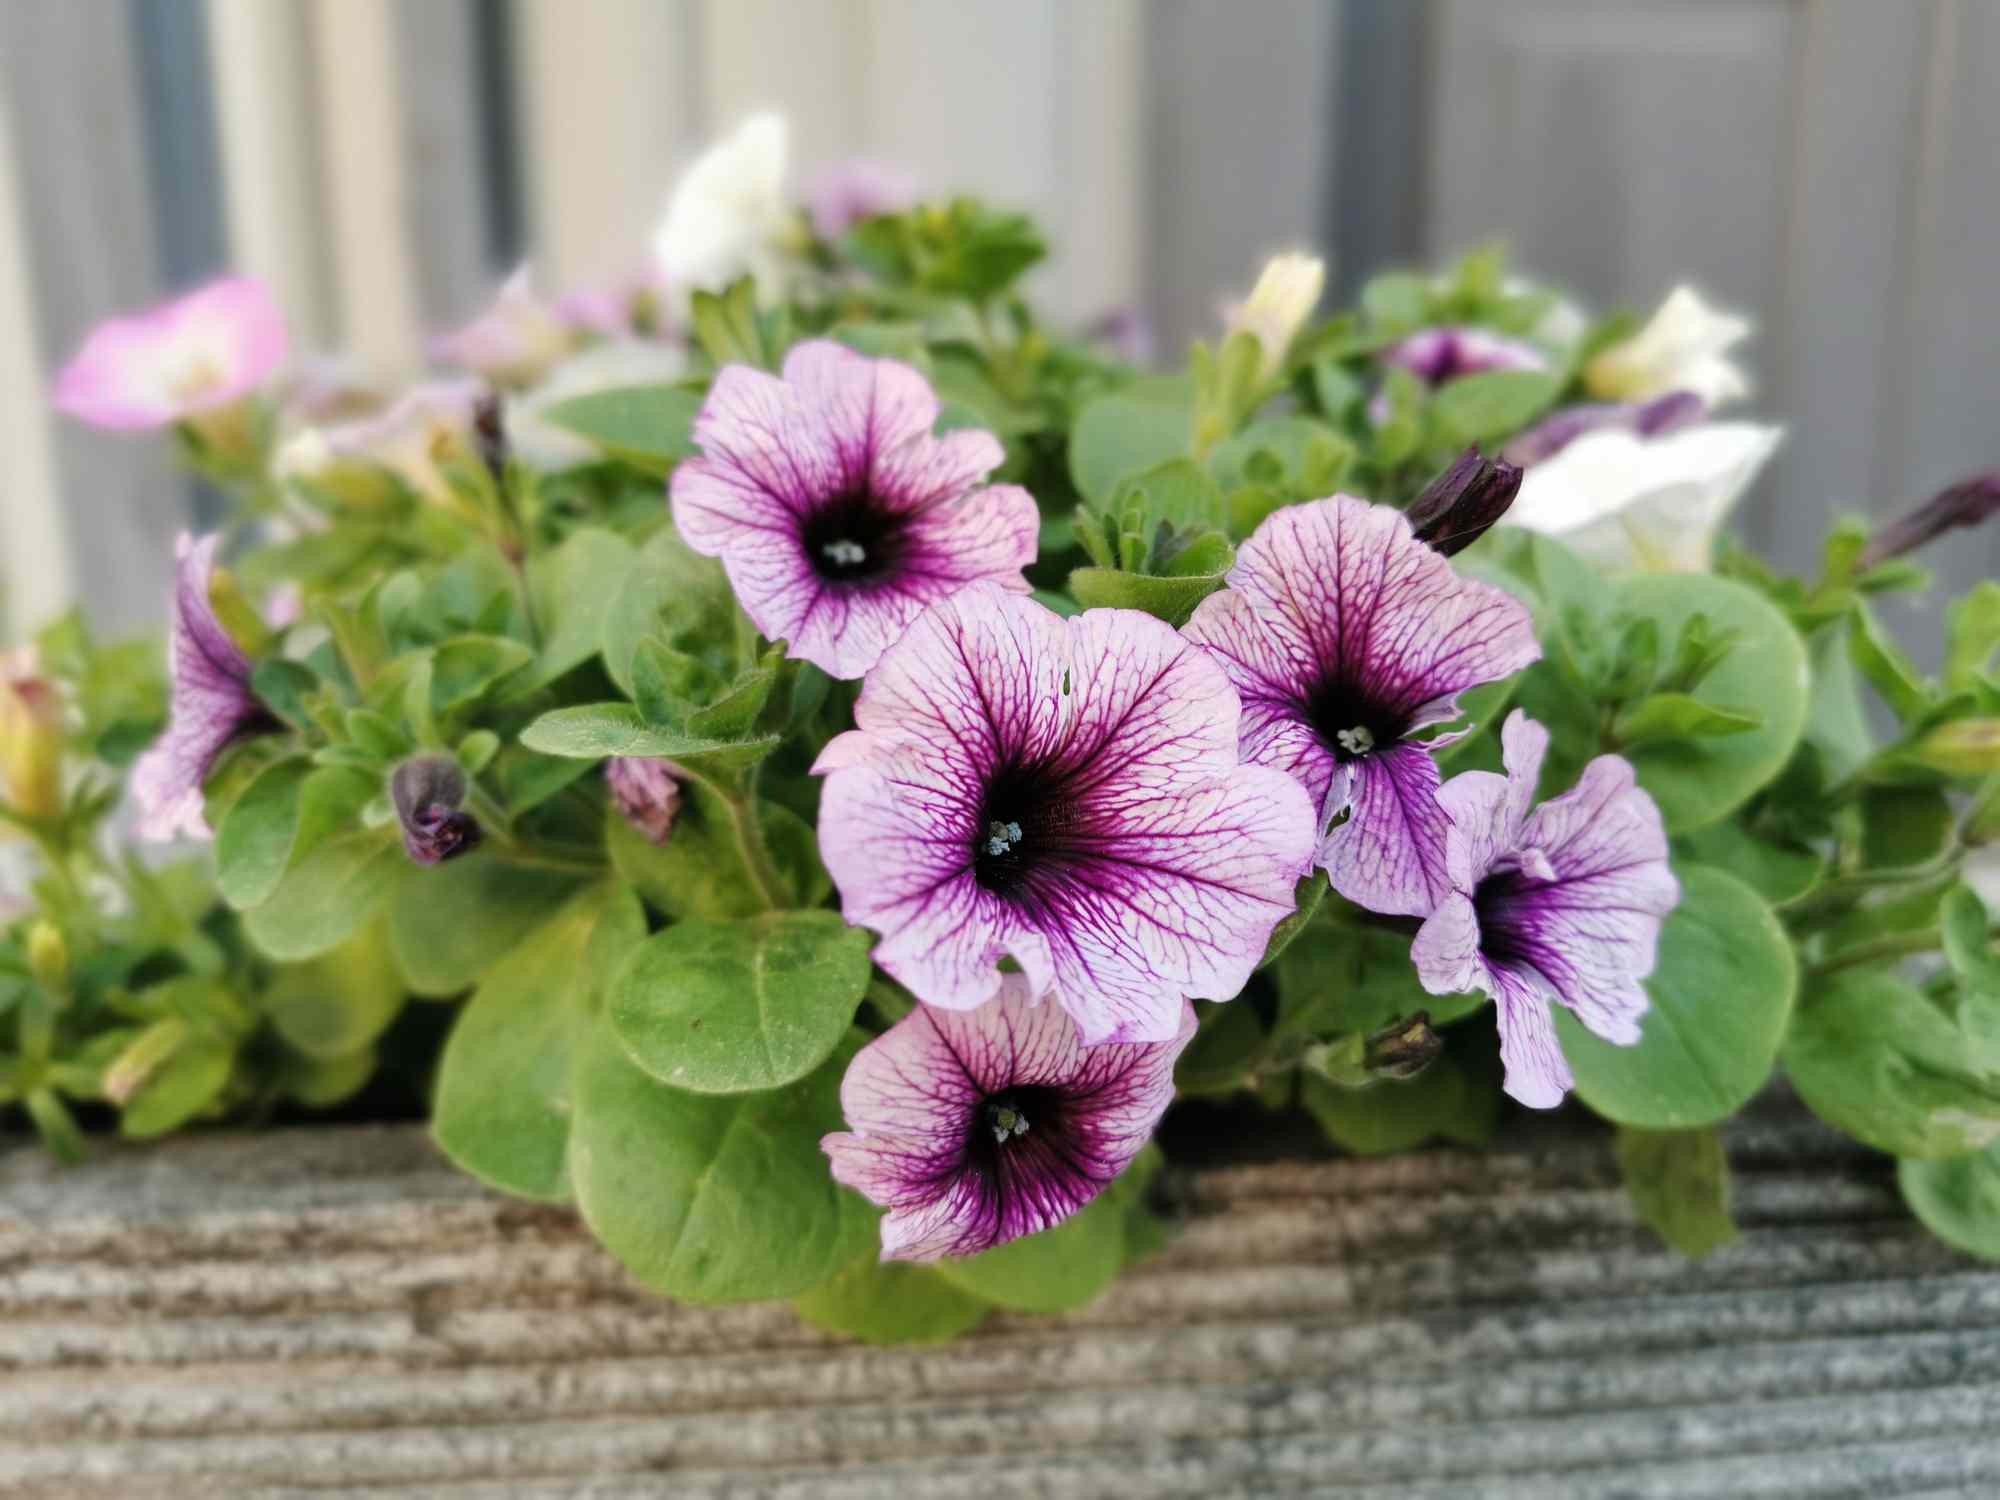 Petunia flowers in window box.